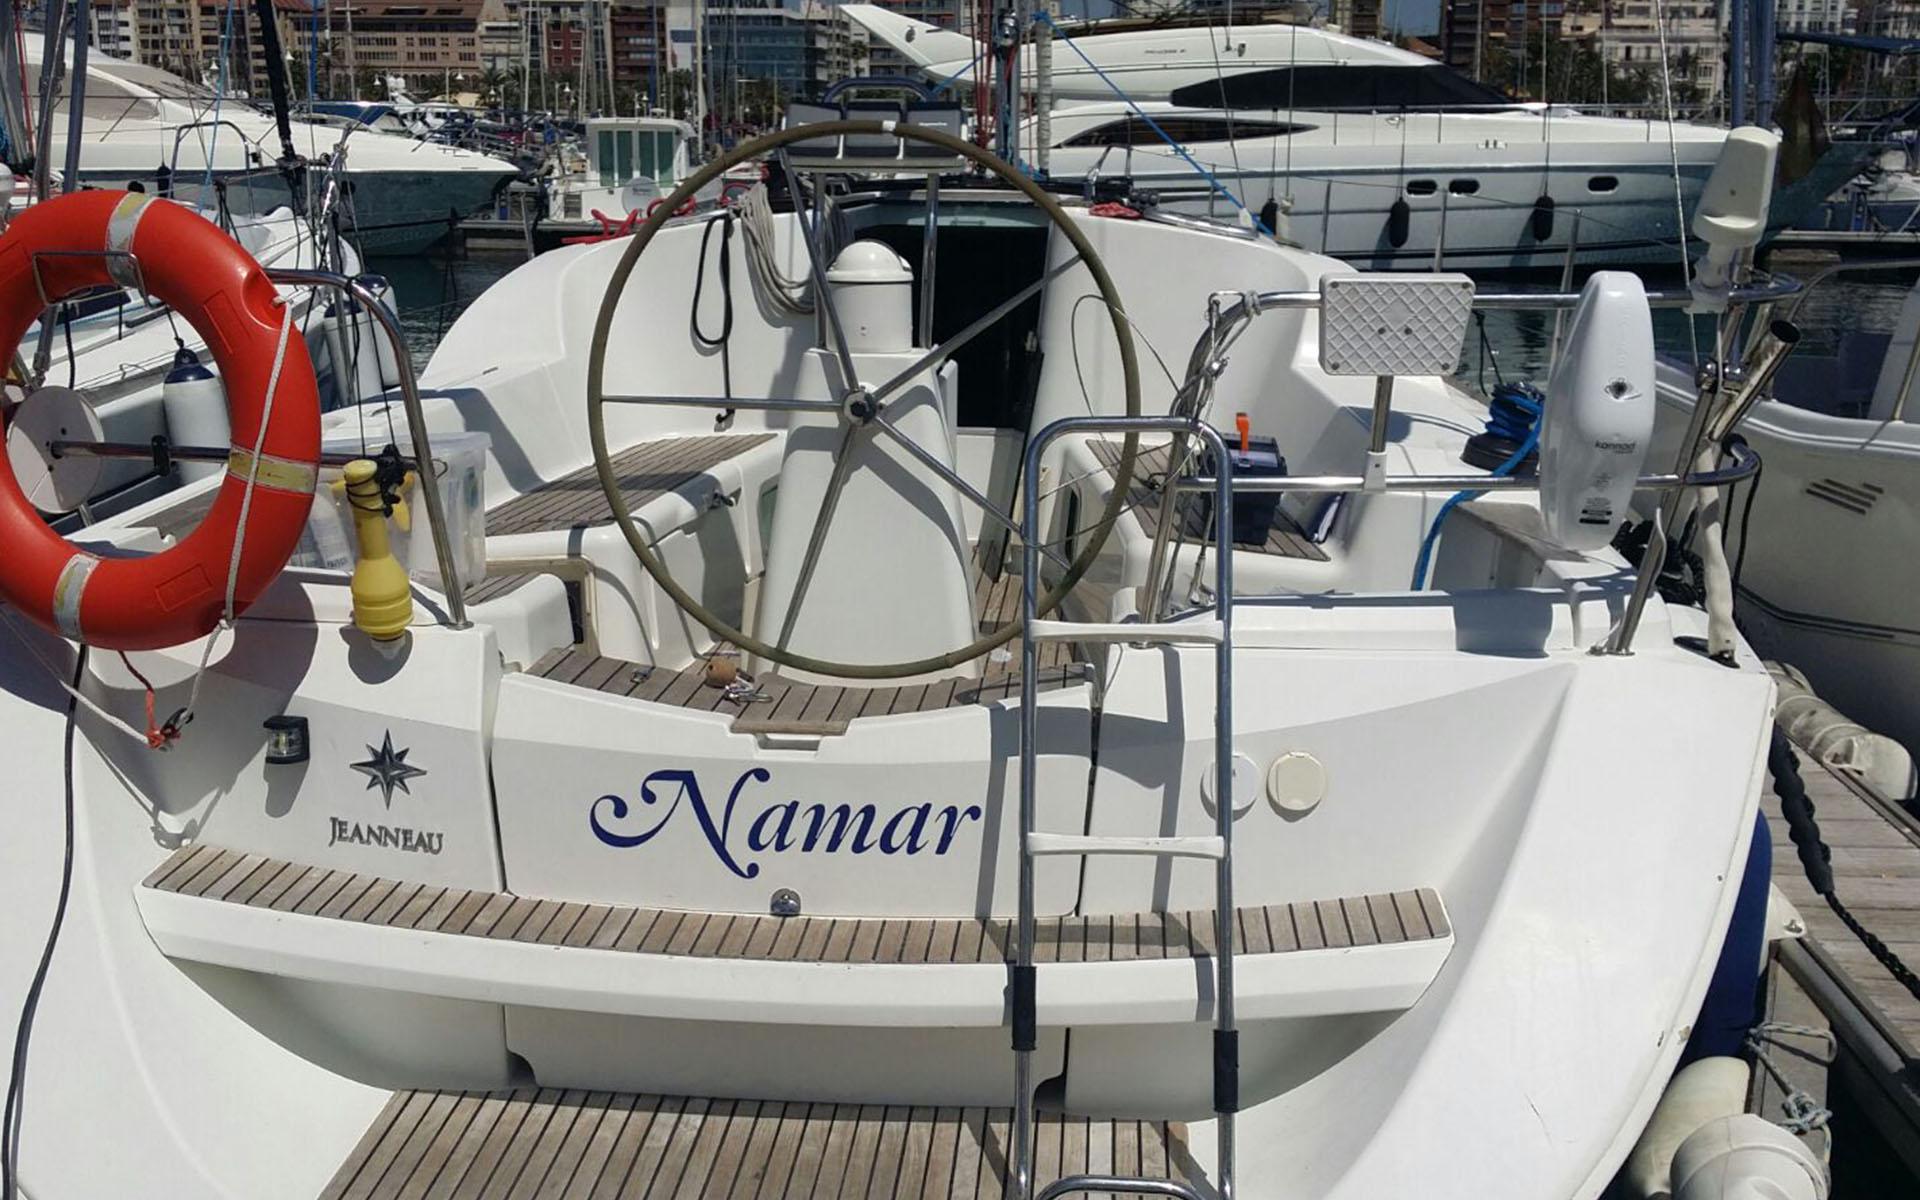 Jeanneau Sun Odyssey 36i (Namar)